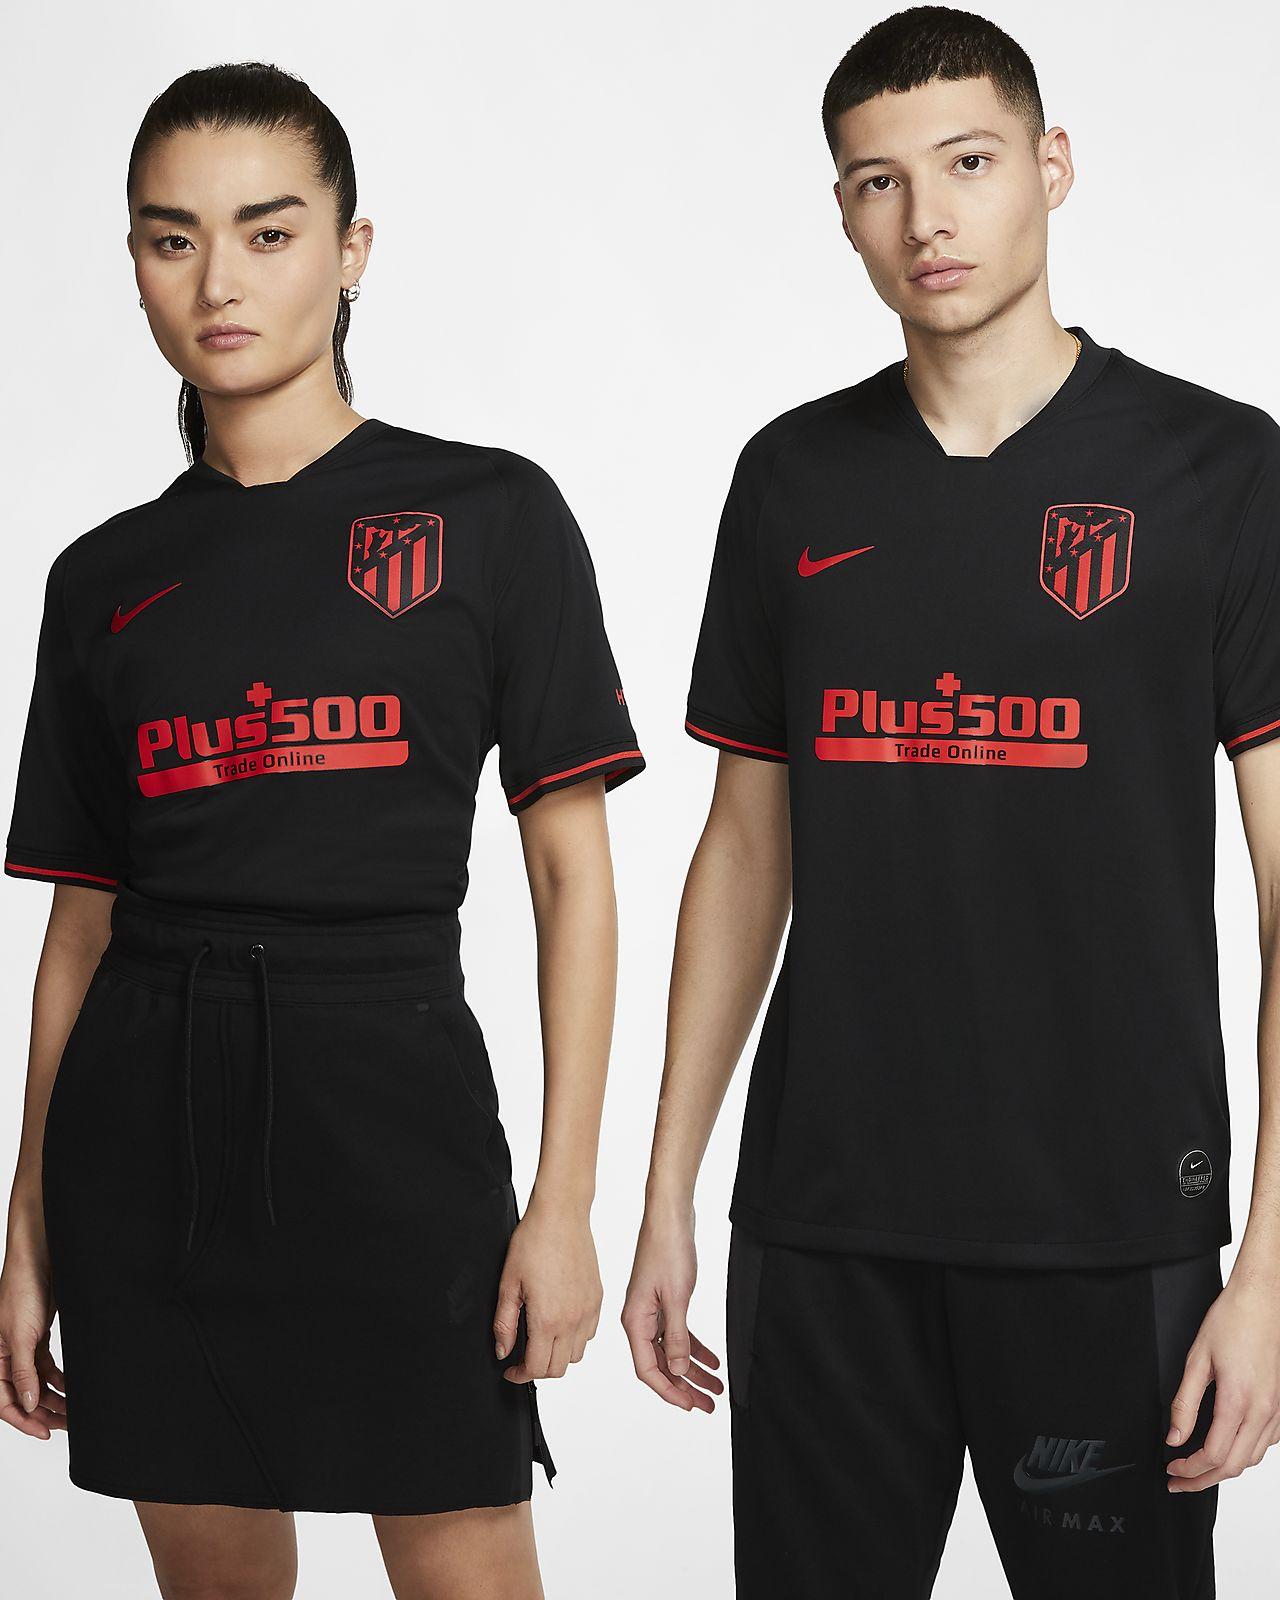 Atlético de Madrid 2019/20 Stadium Away Herren-Fußballtrikot